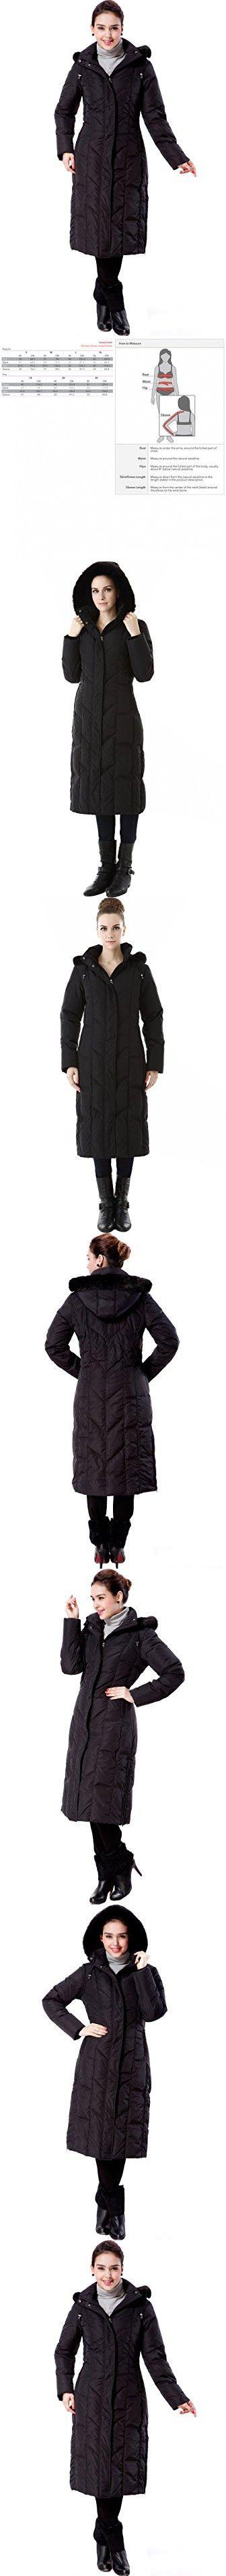 "BGSD Women's ""Tisha"" Water Resistant Long Hooded Down Parka Coat - Black Medium"